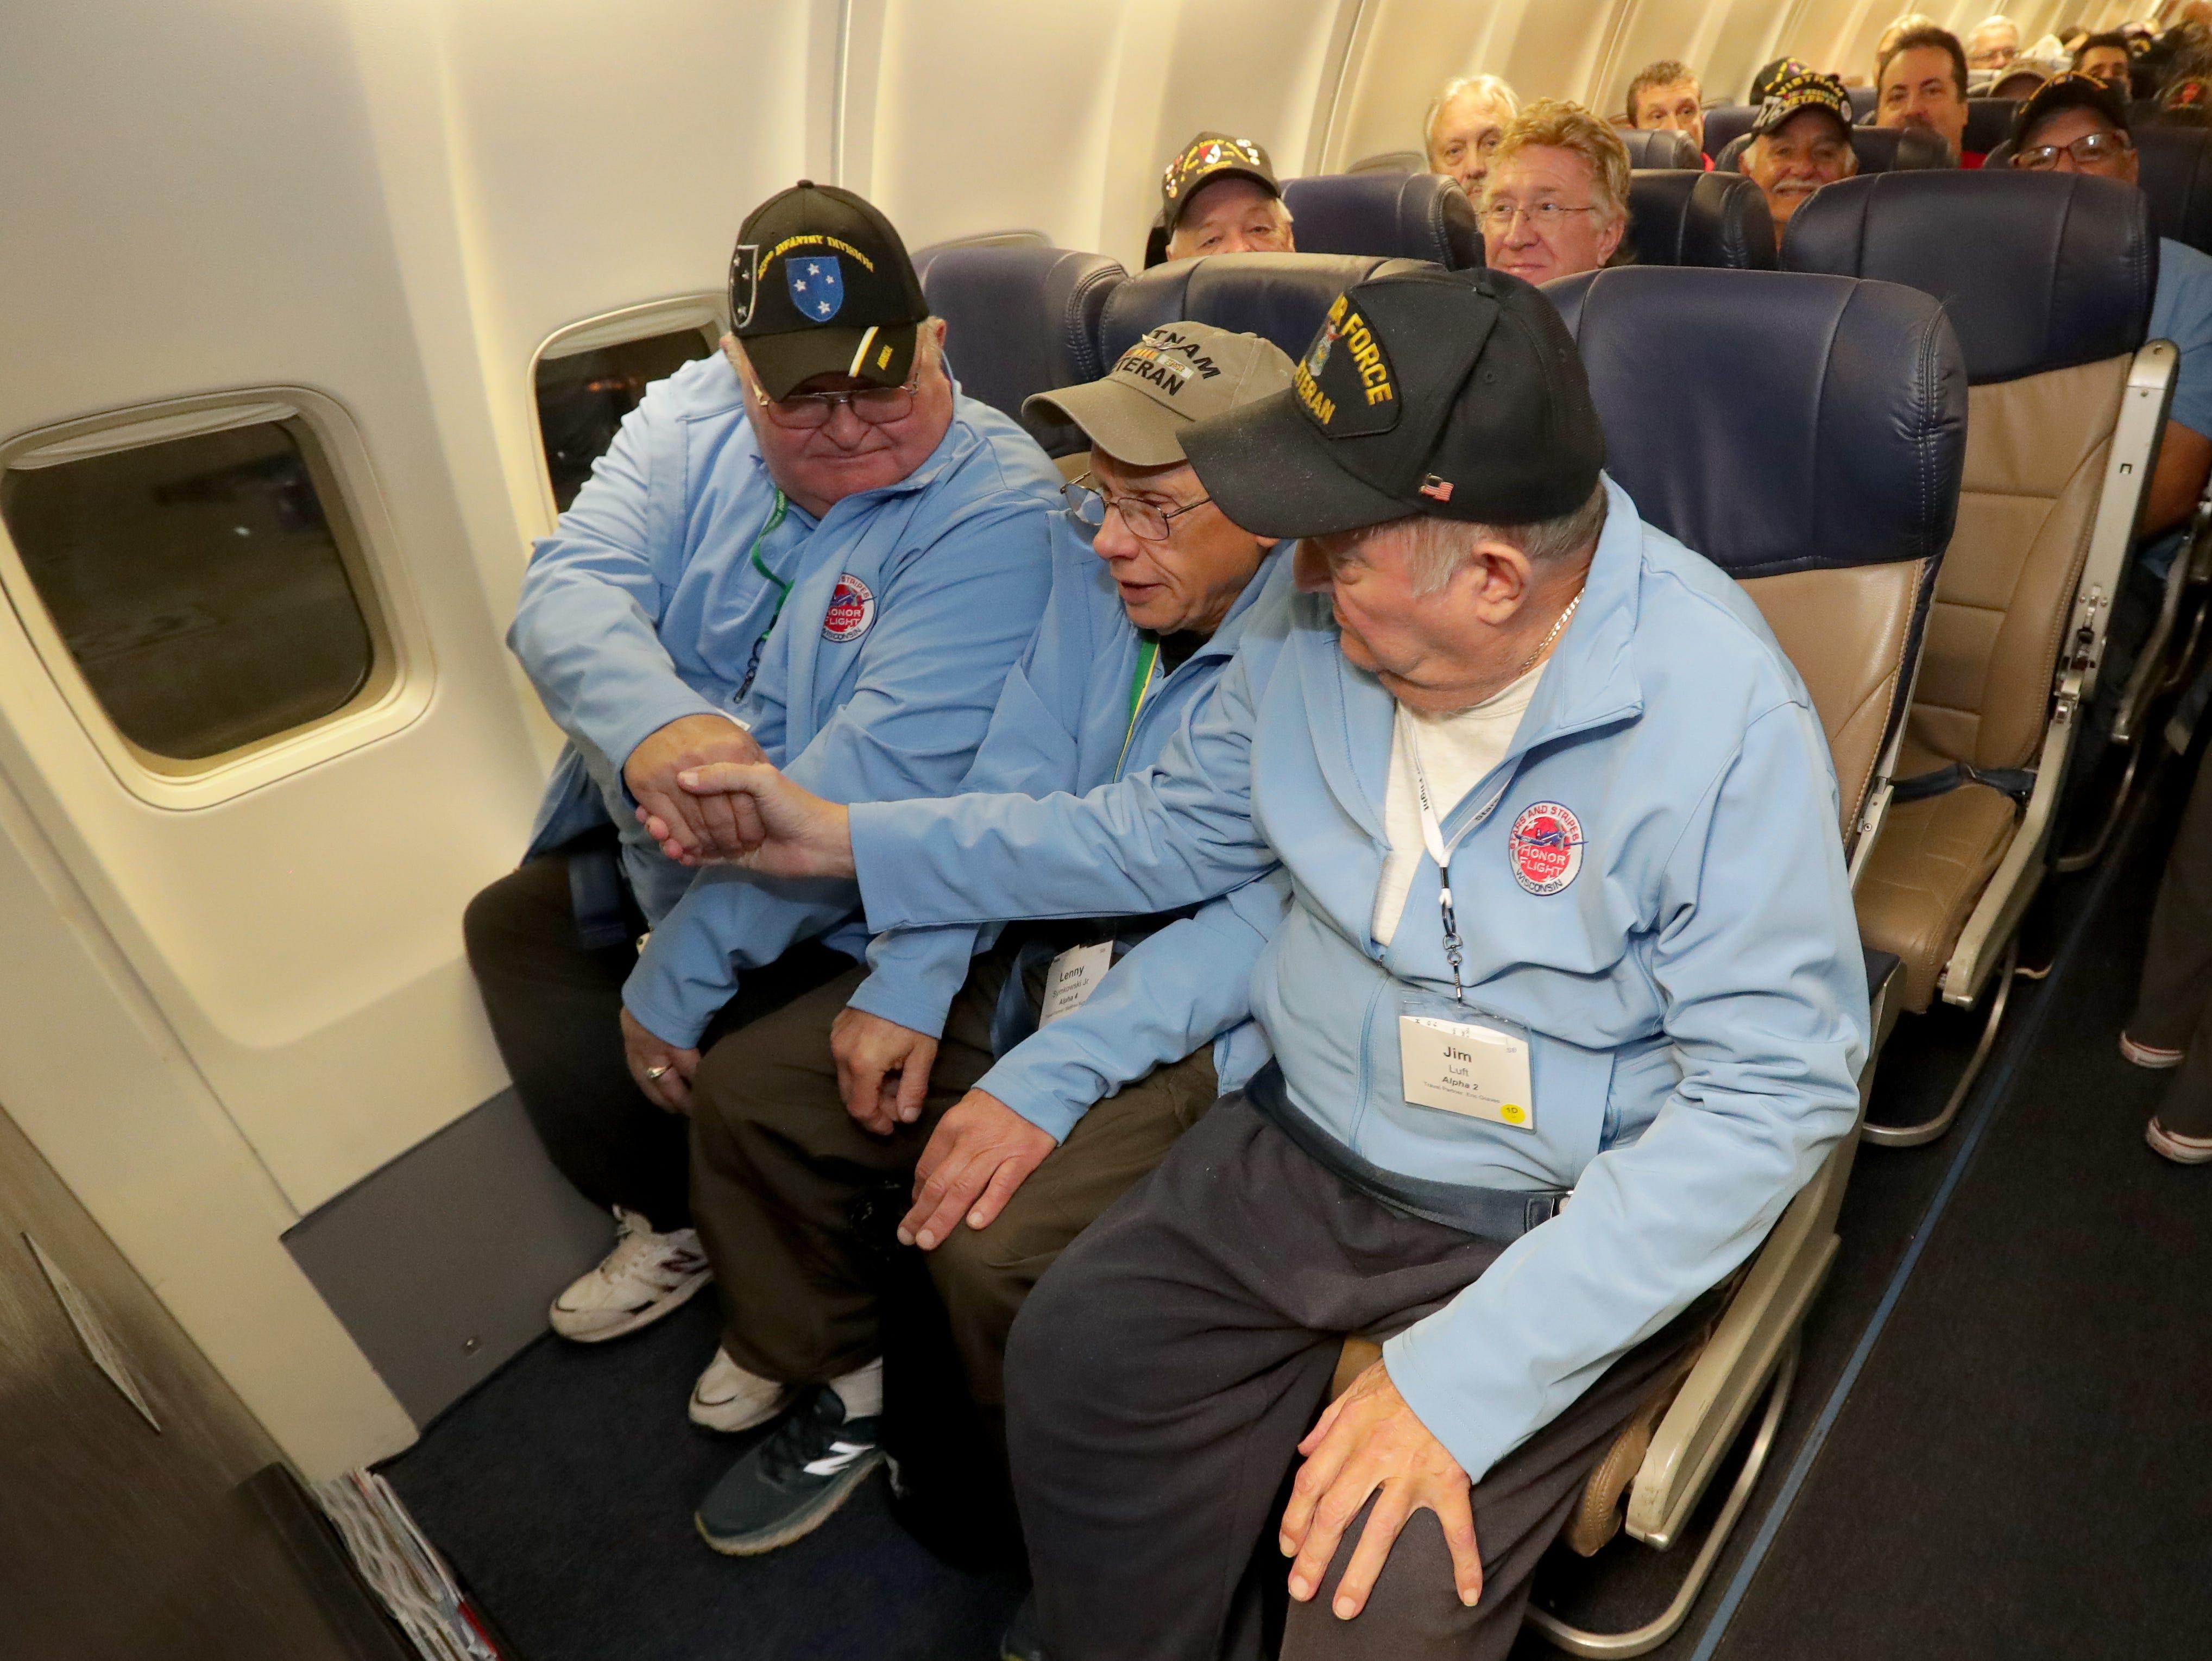 Vietnam War veterans John Dahl (from left), Lenny Symkowski and Jim Luft introduce themselves on the plane.